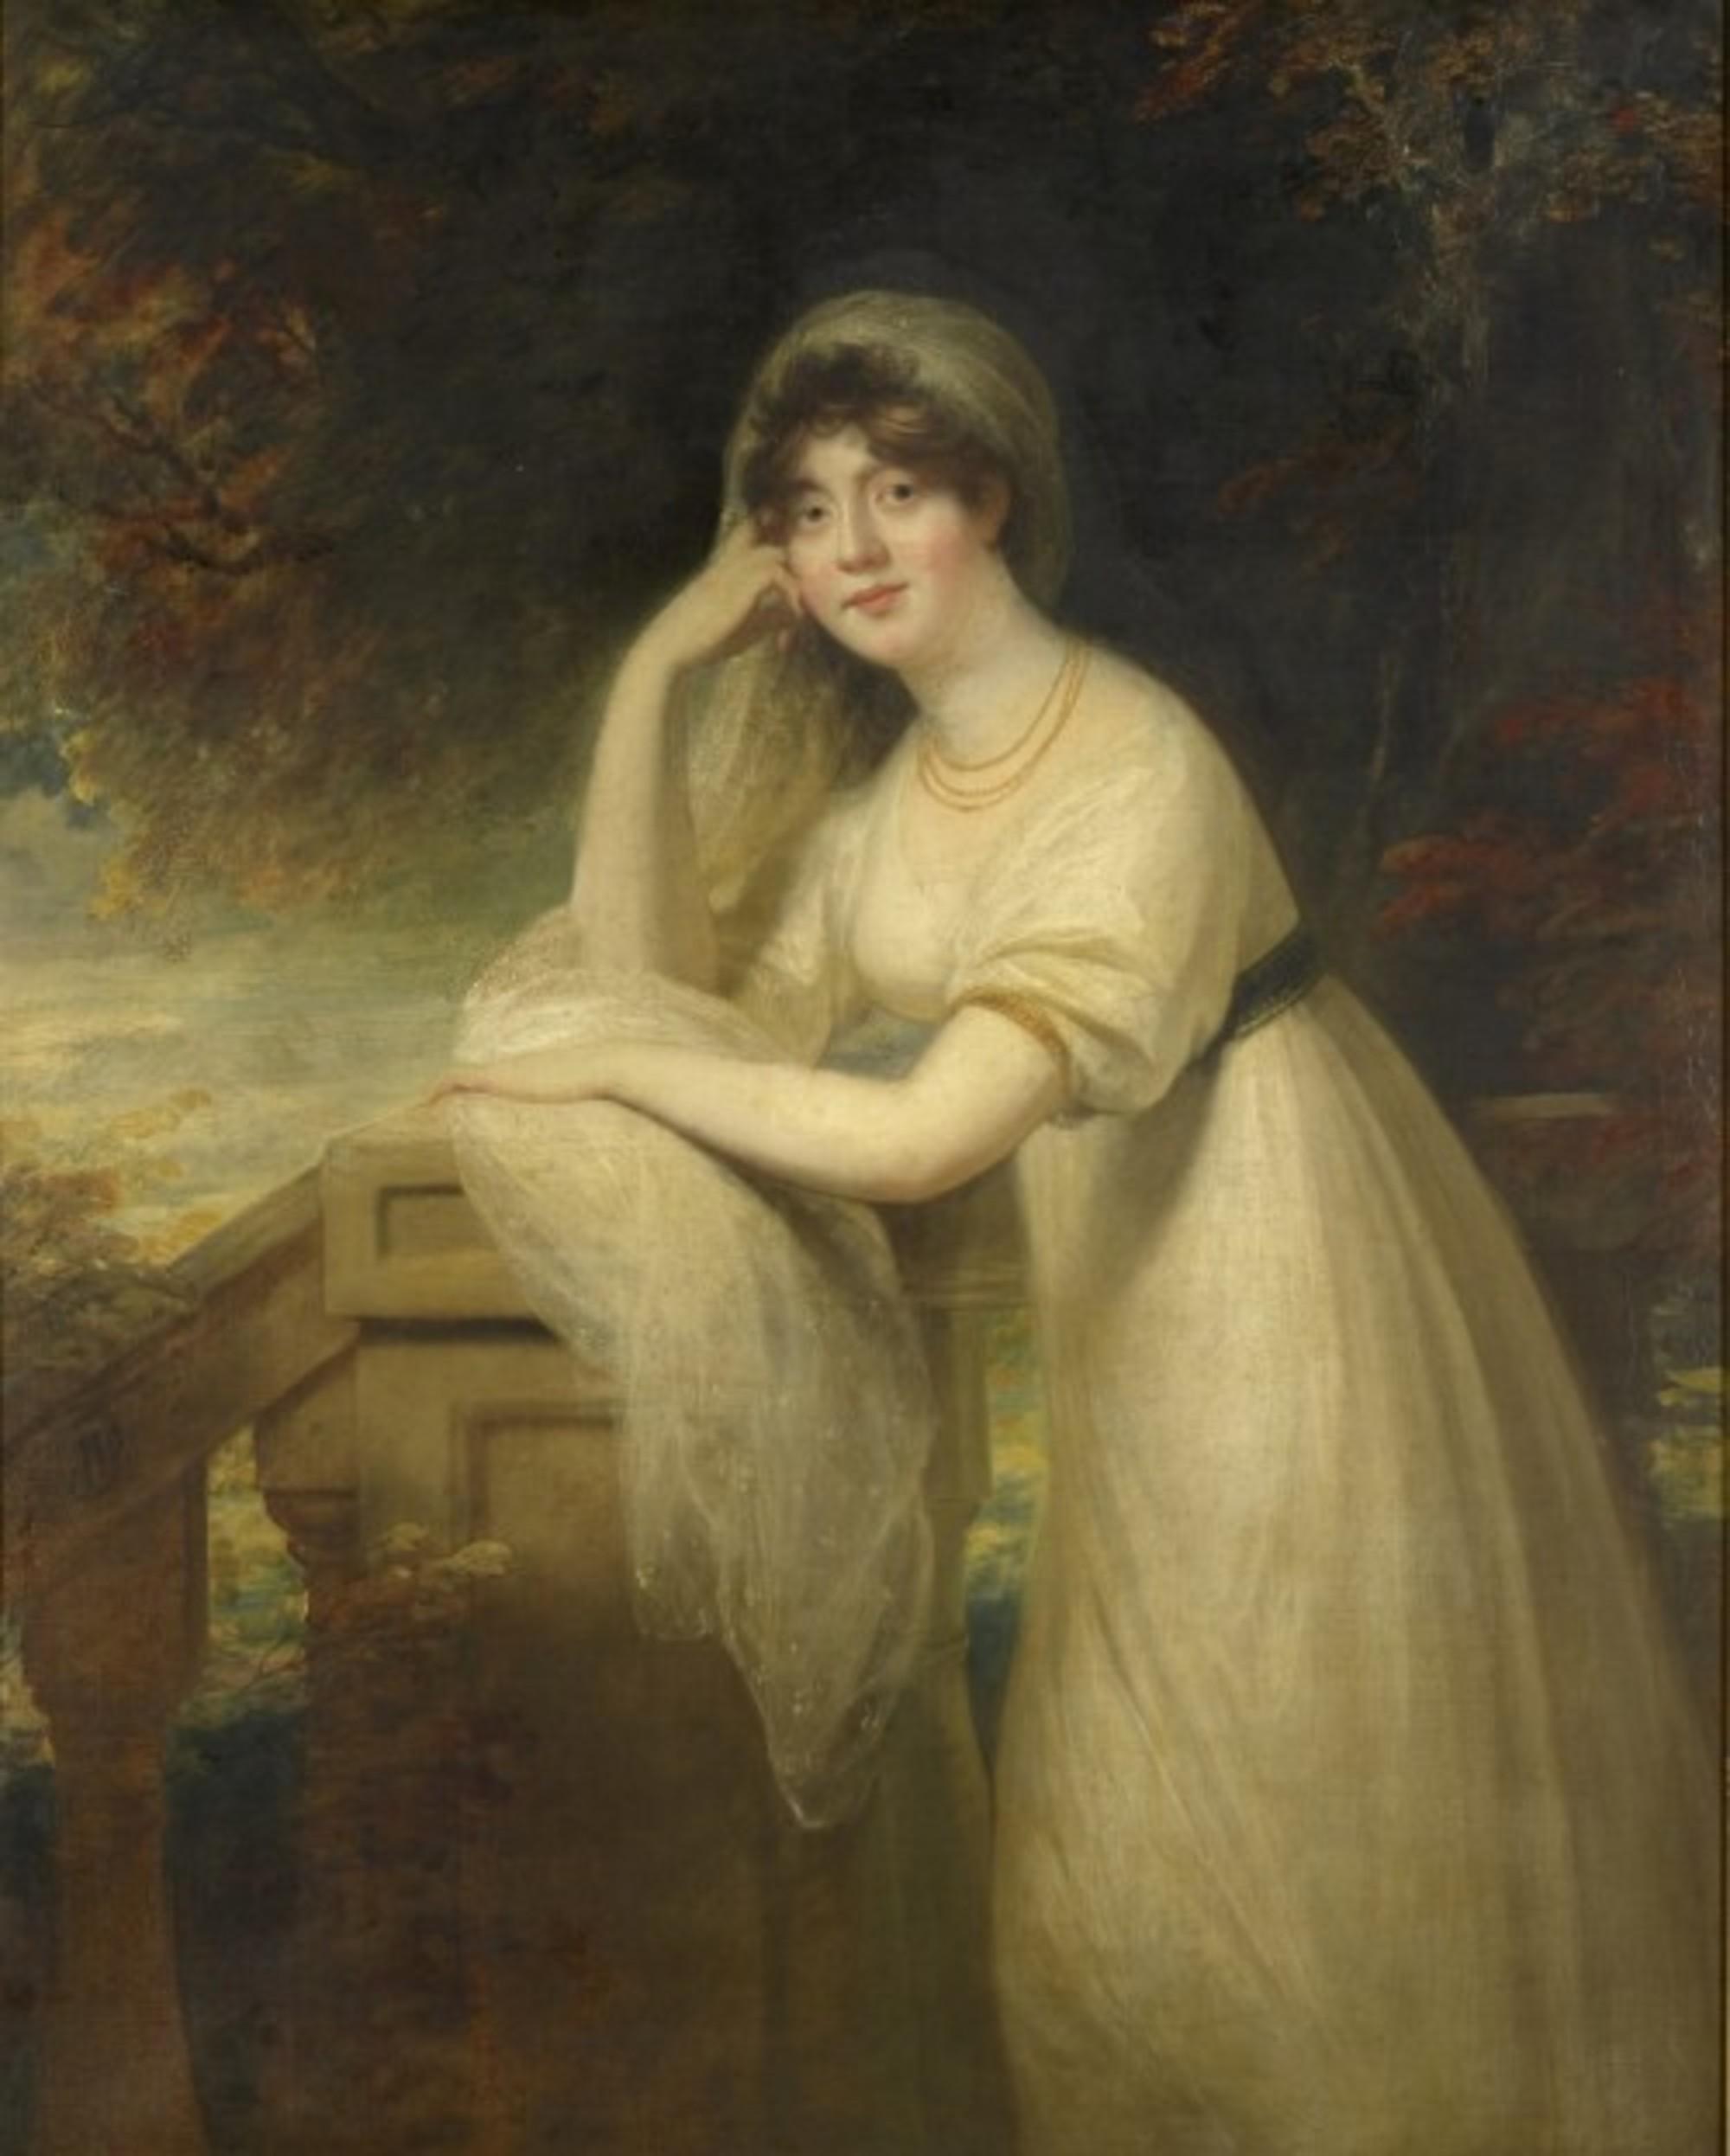 Princess-Sophia-Matilda-of-Gloucester---Beechey-1803-5.jpg